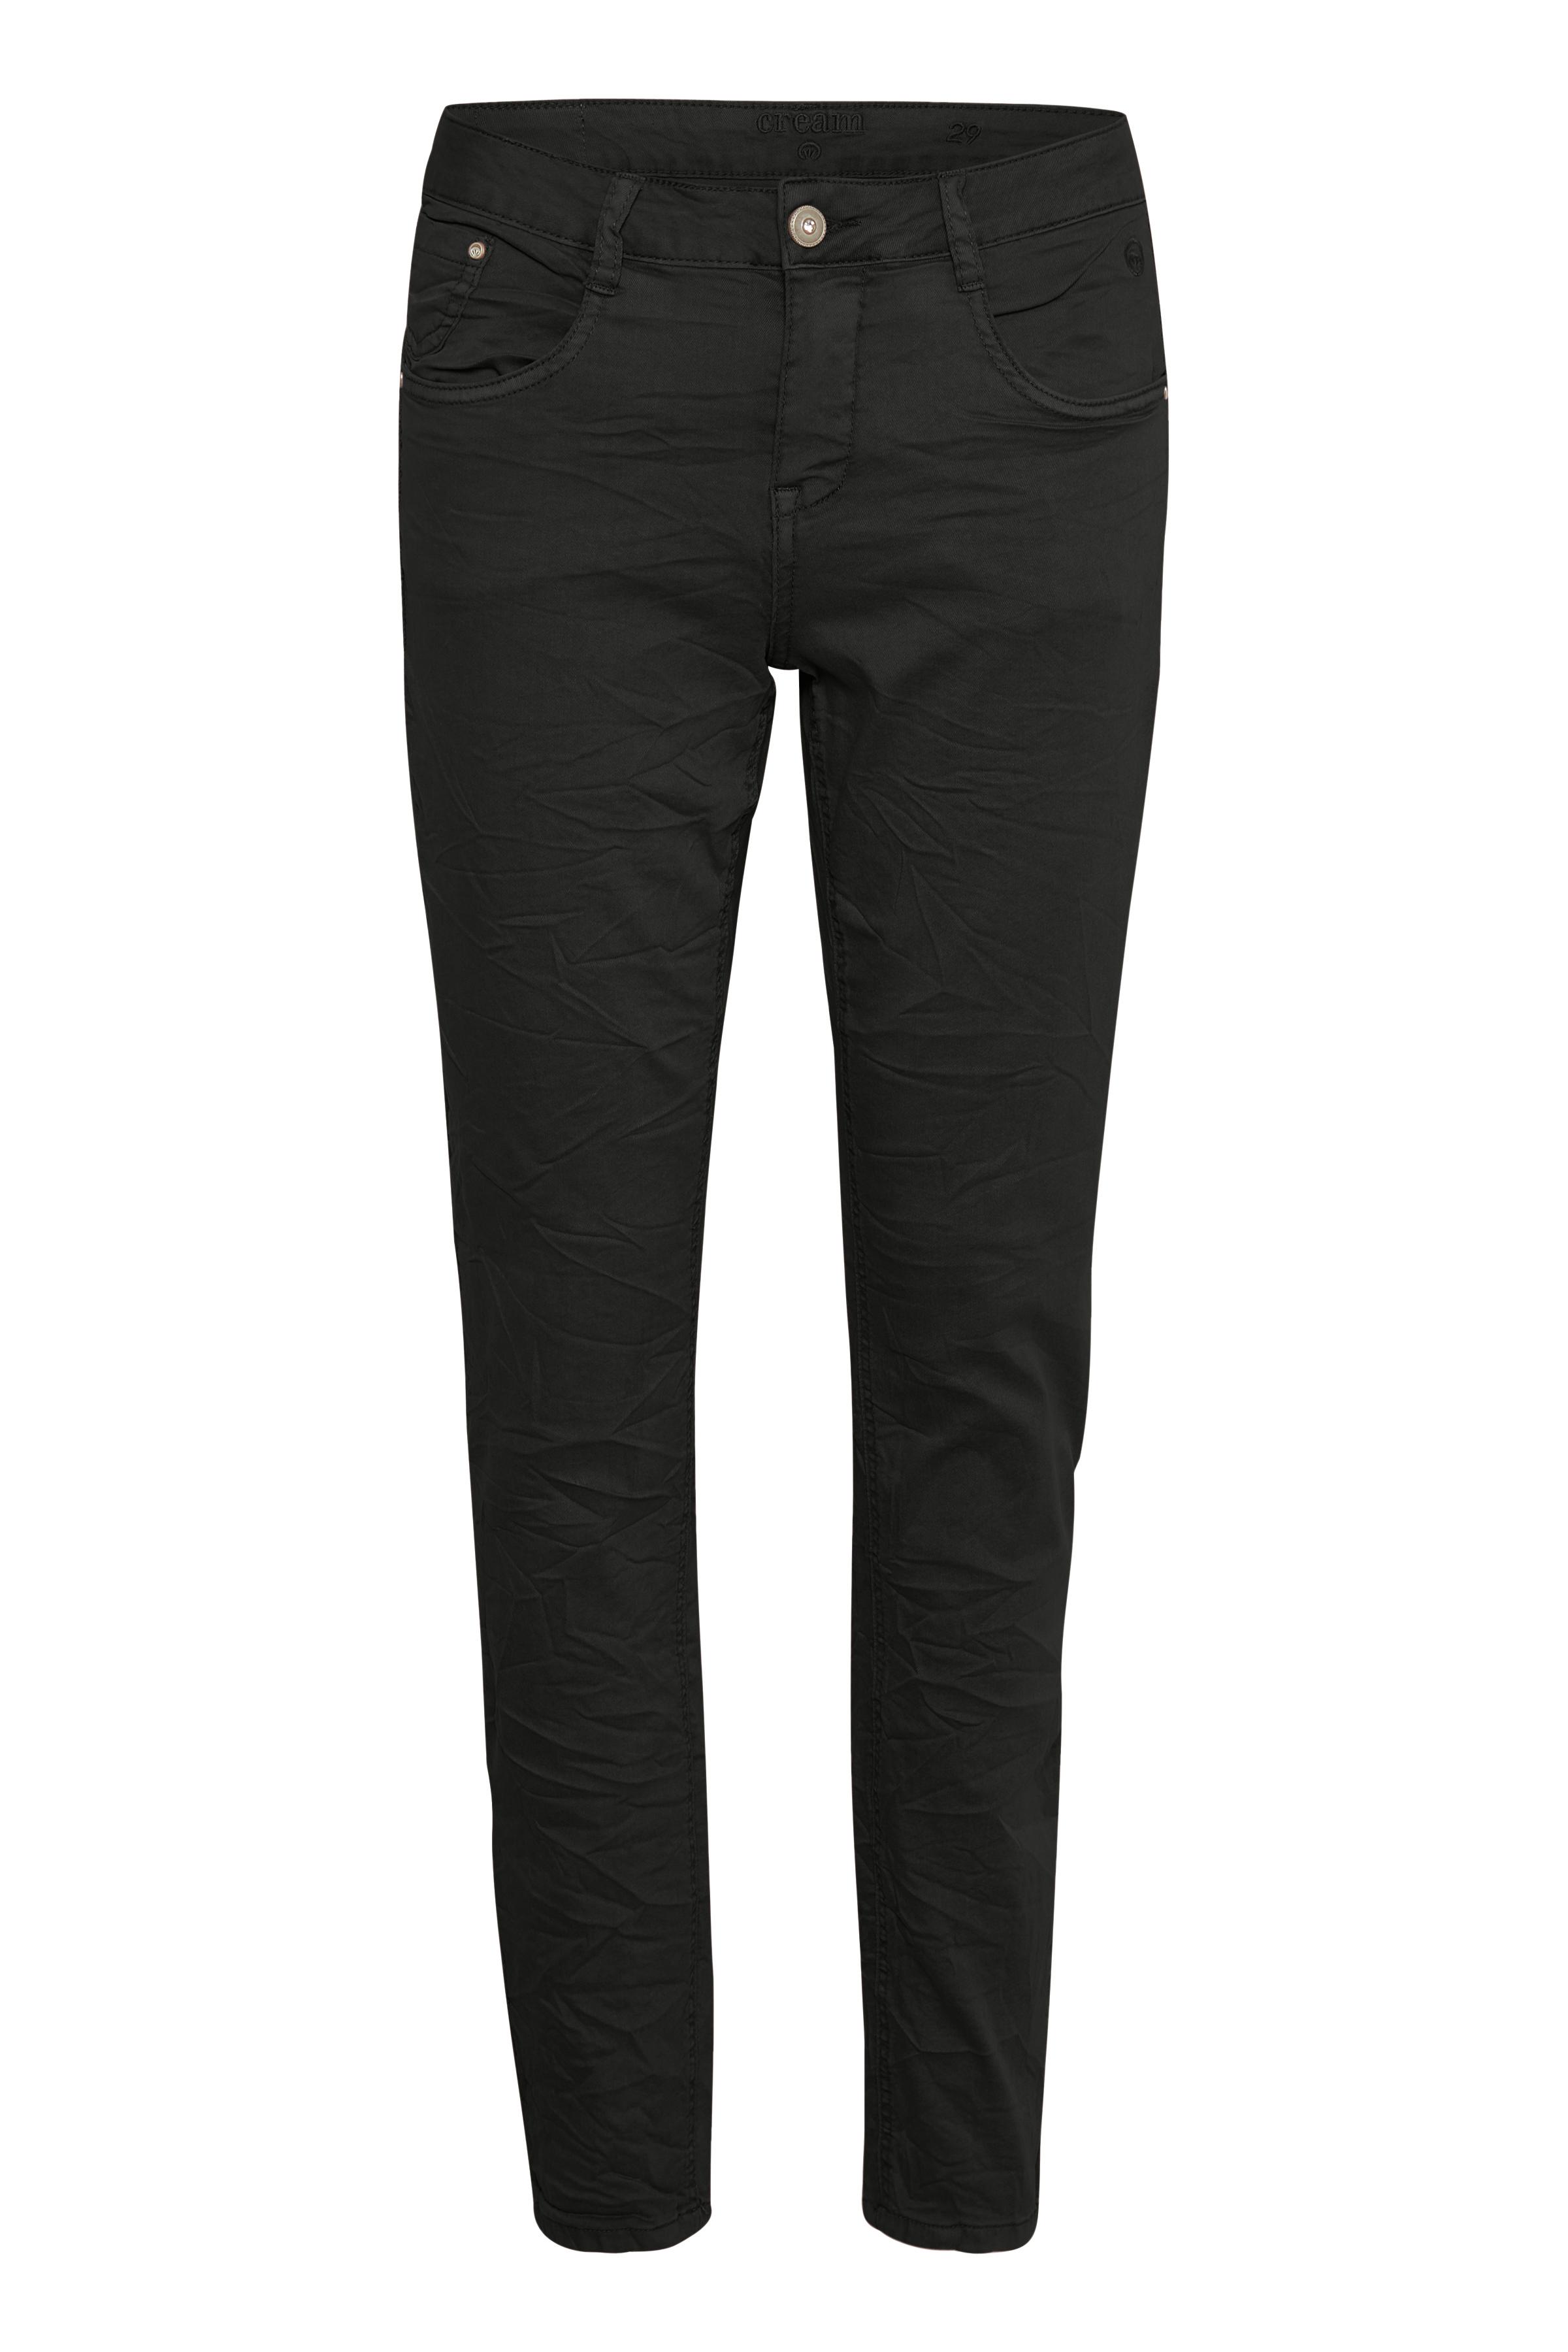 Image of Cream Dame Normal pasformet Lotte jeans - Sort